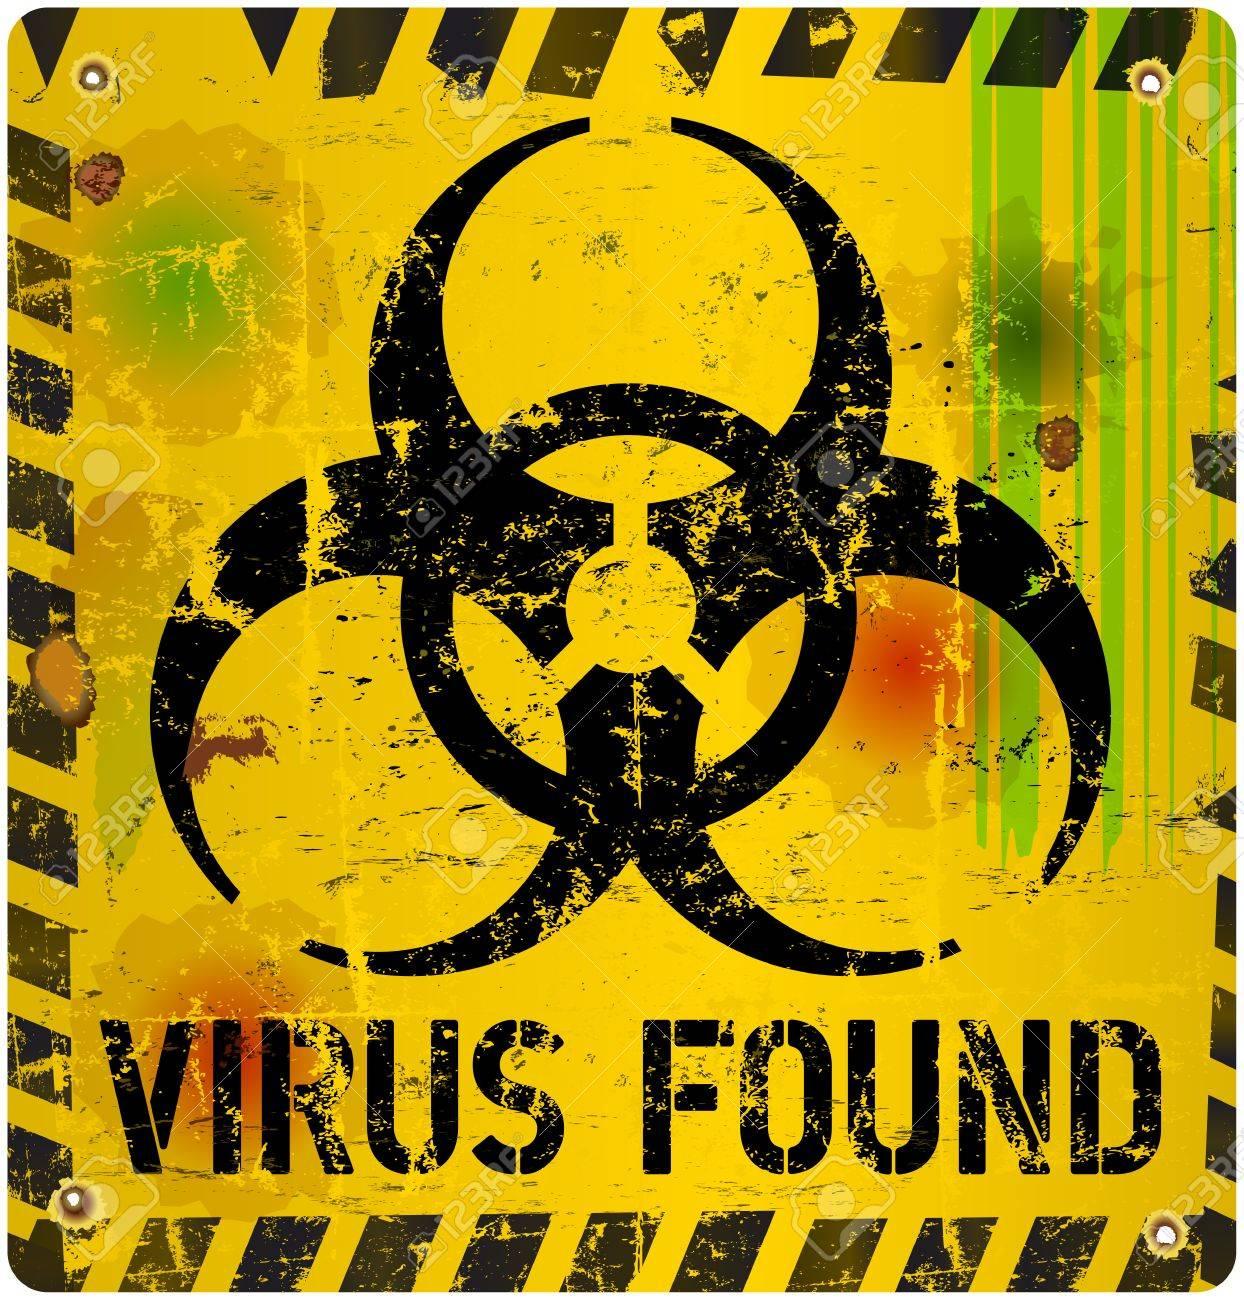 computer virus alert sign, vector illustration Stock Vector - 24733007